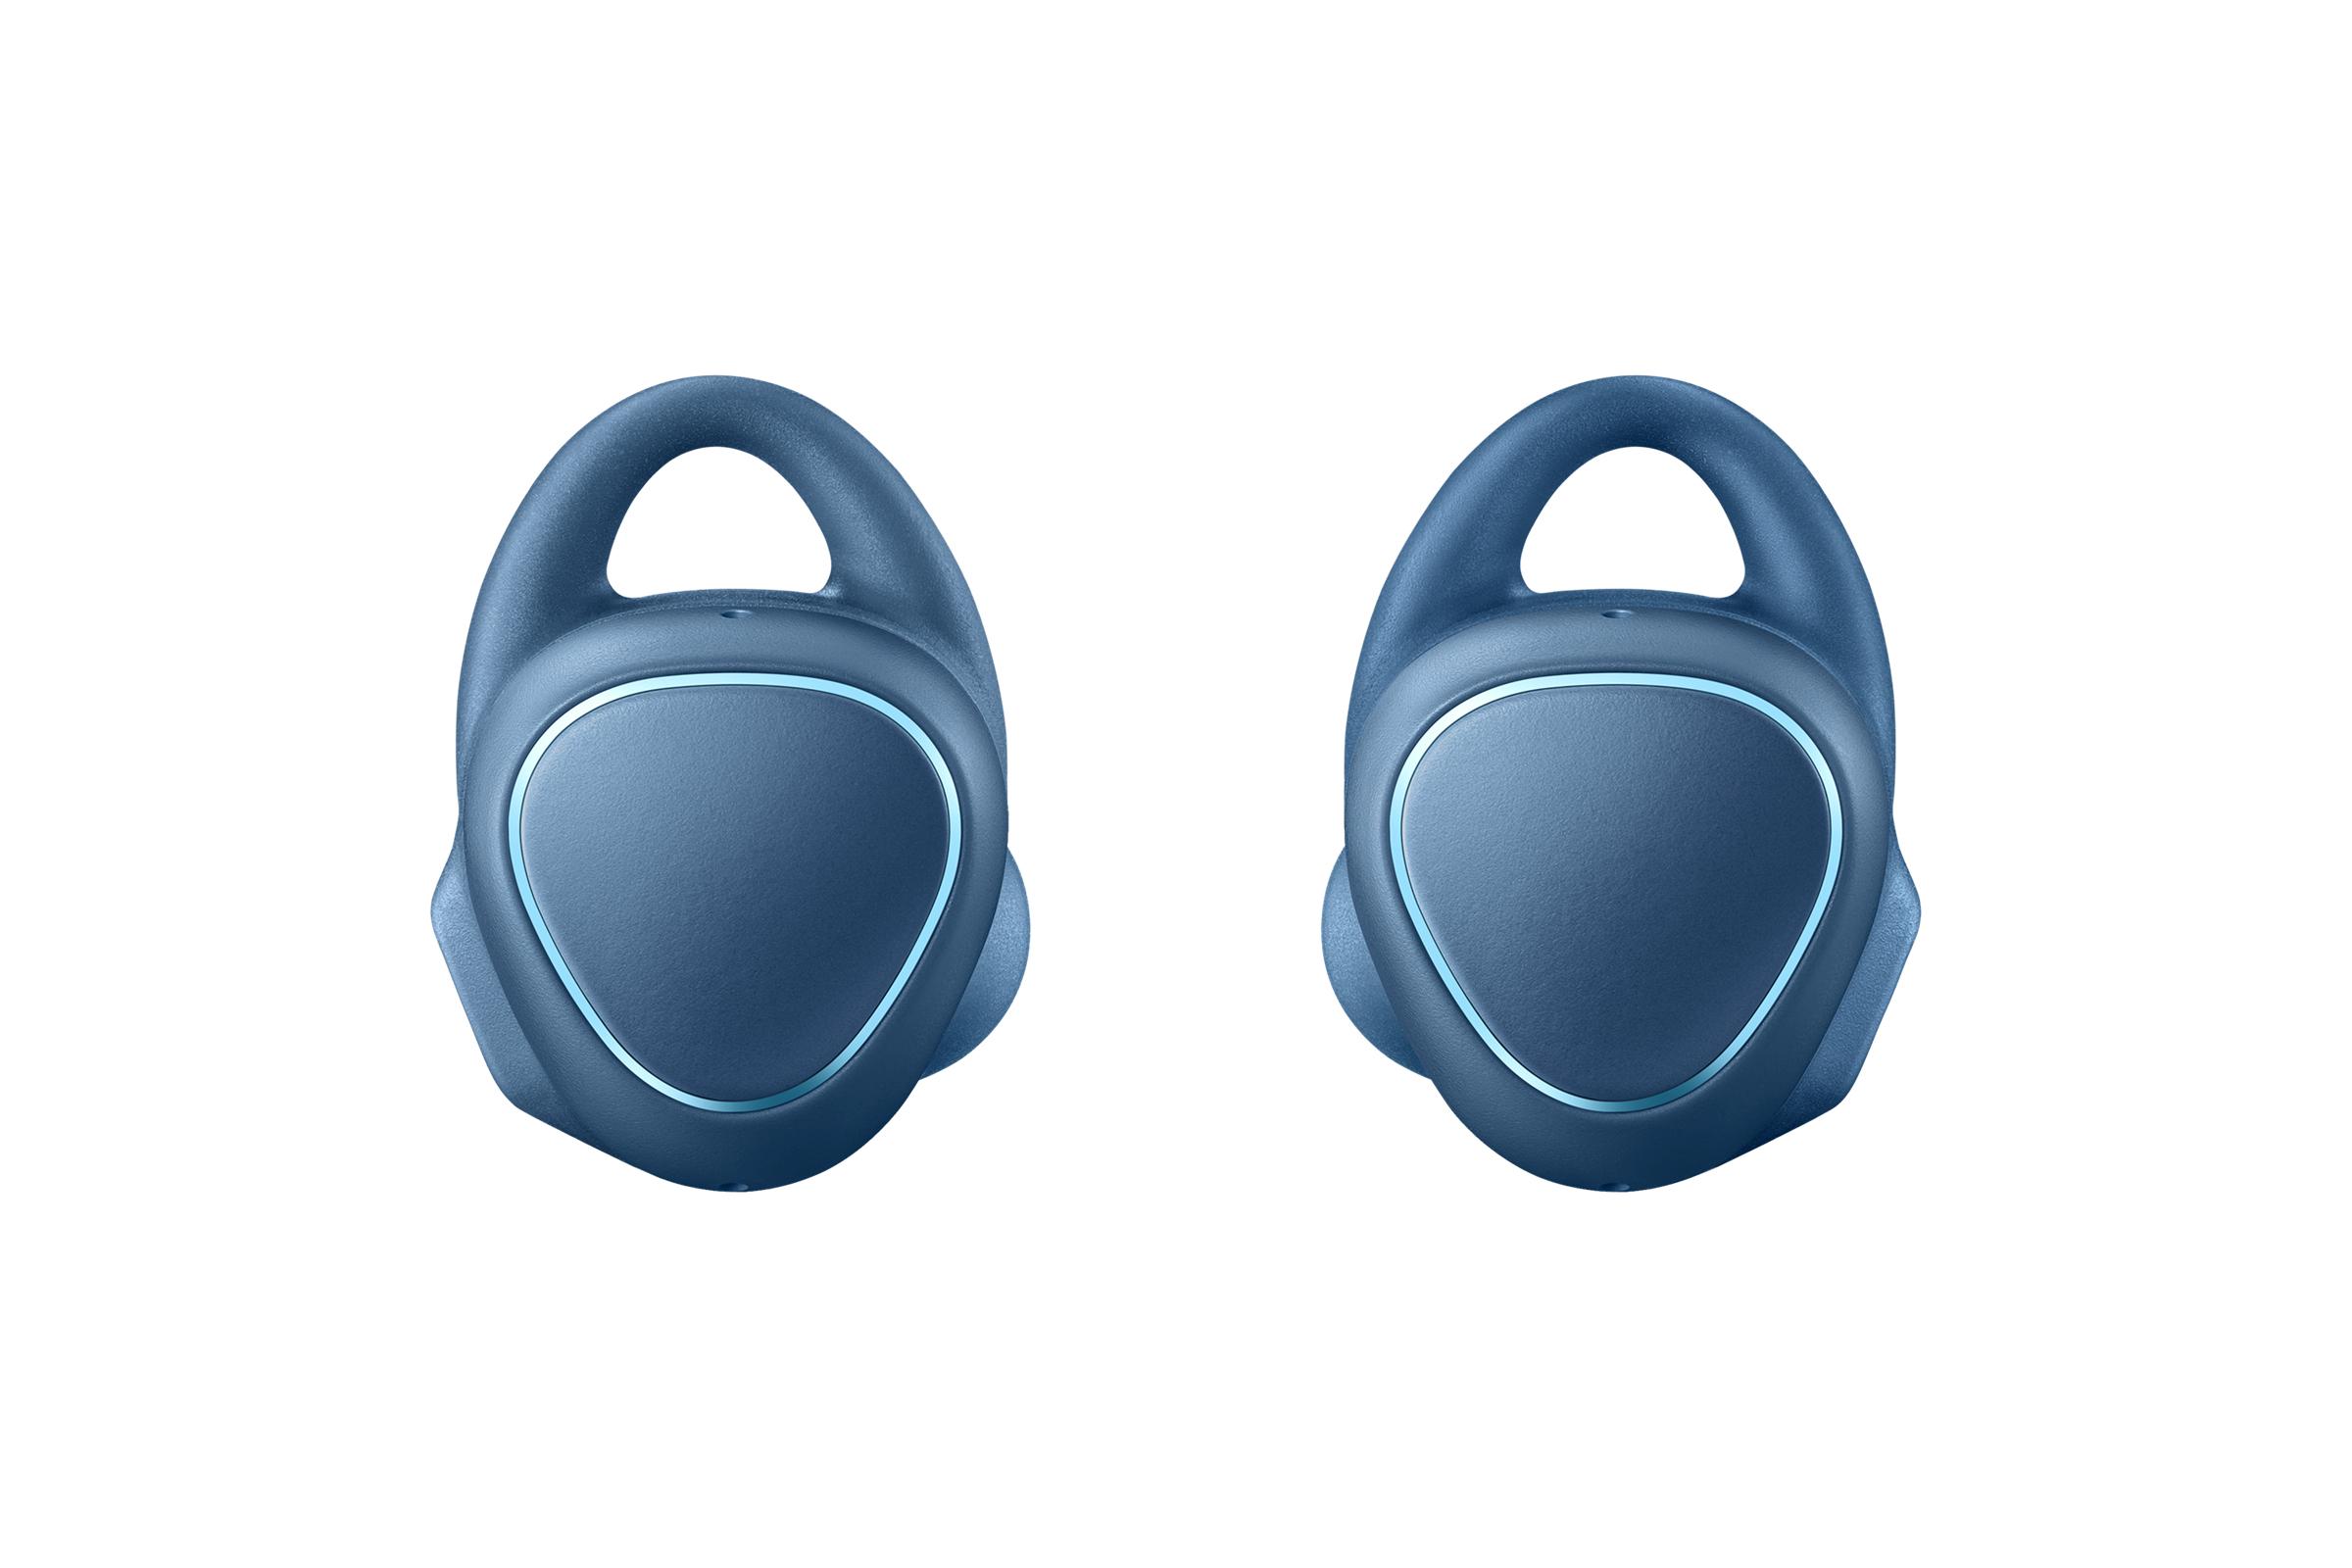 Samsung Gear IconX 3